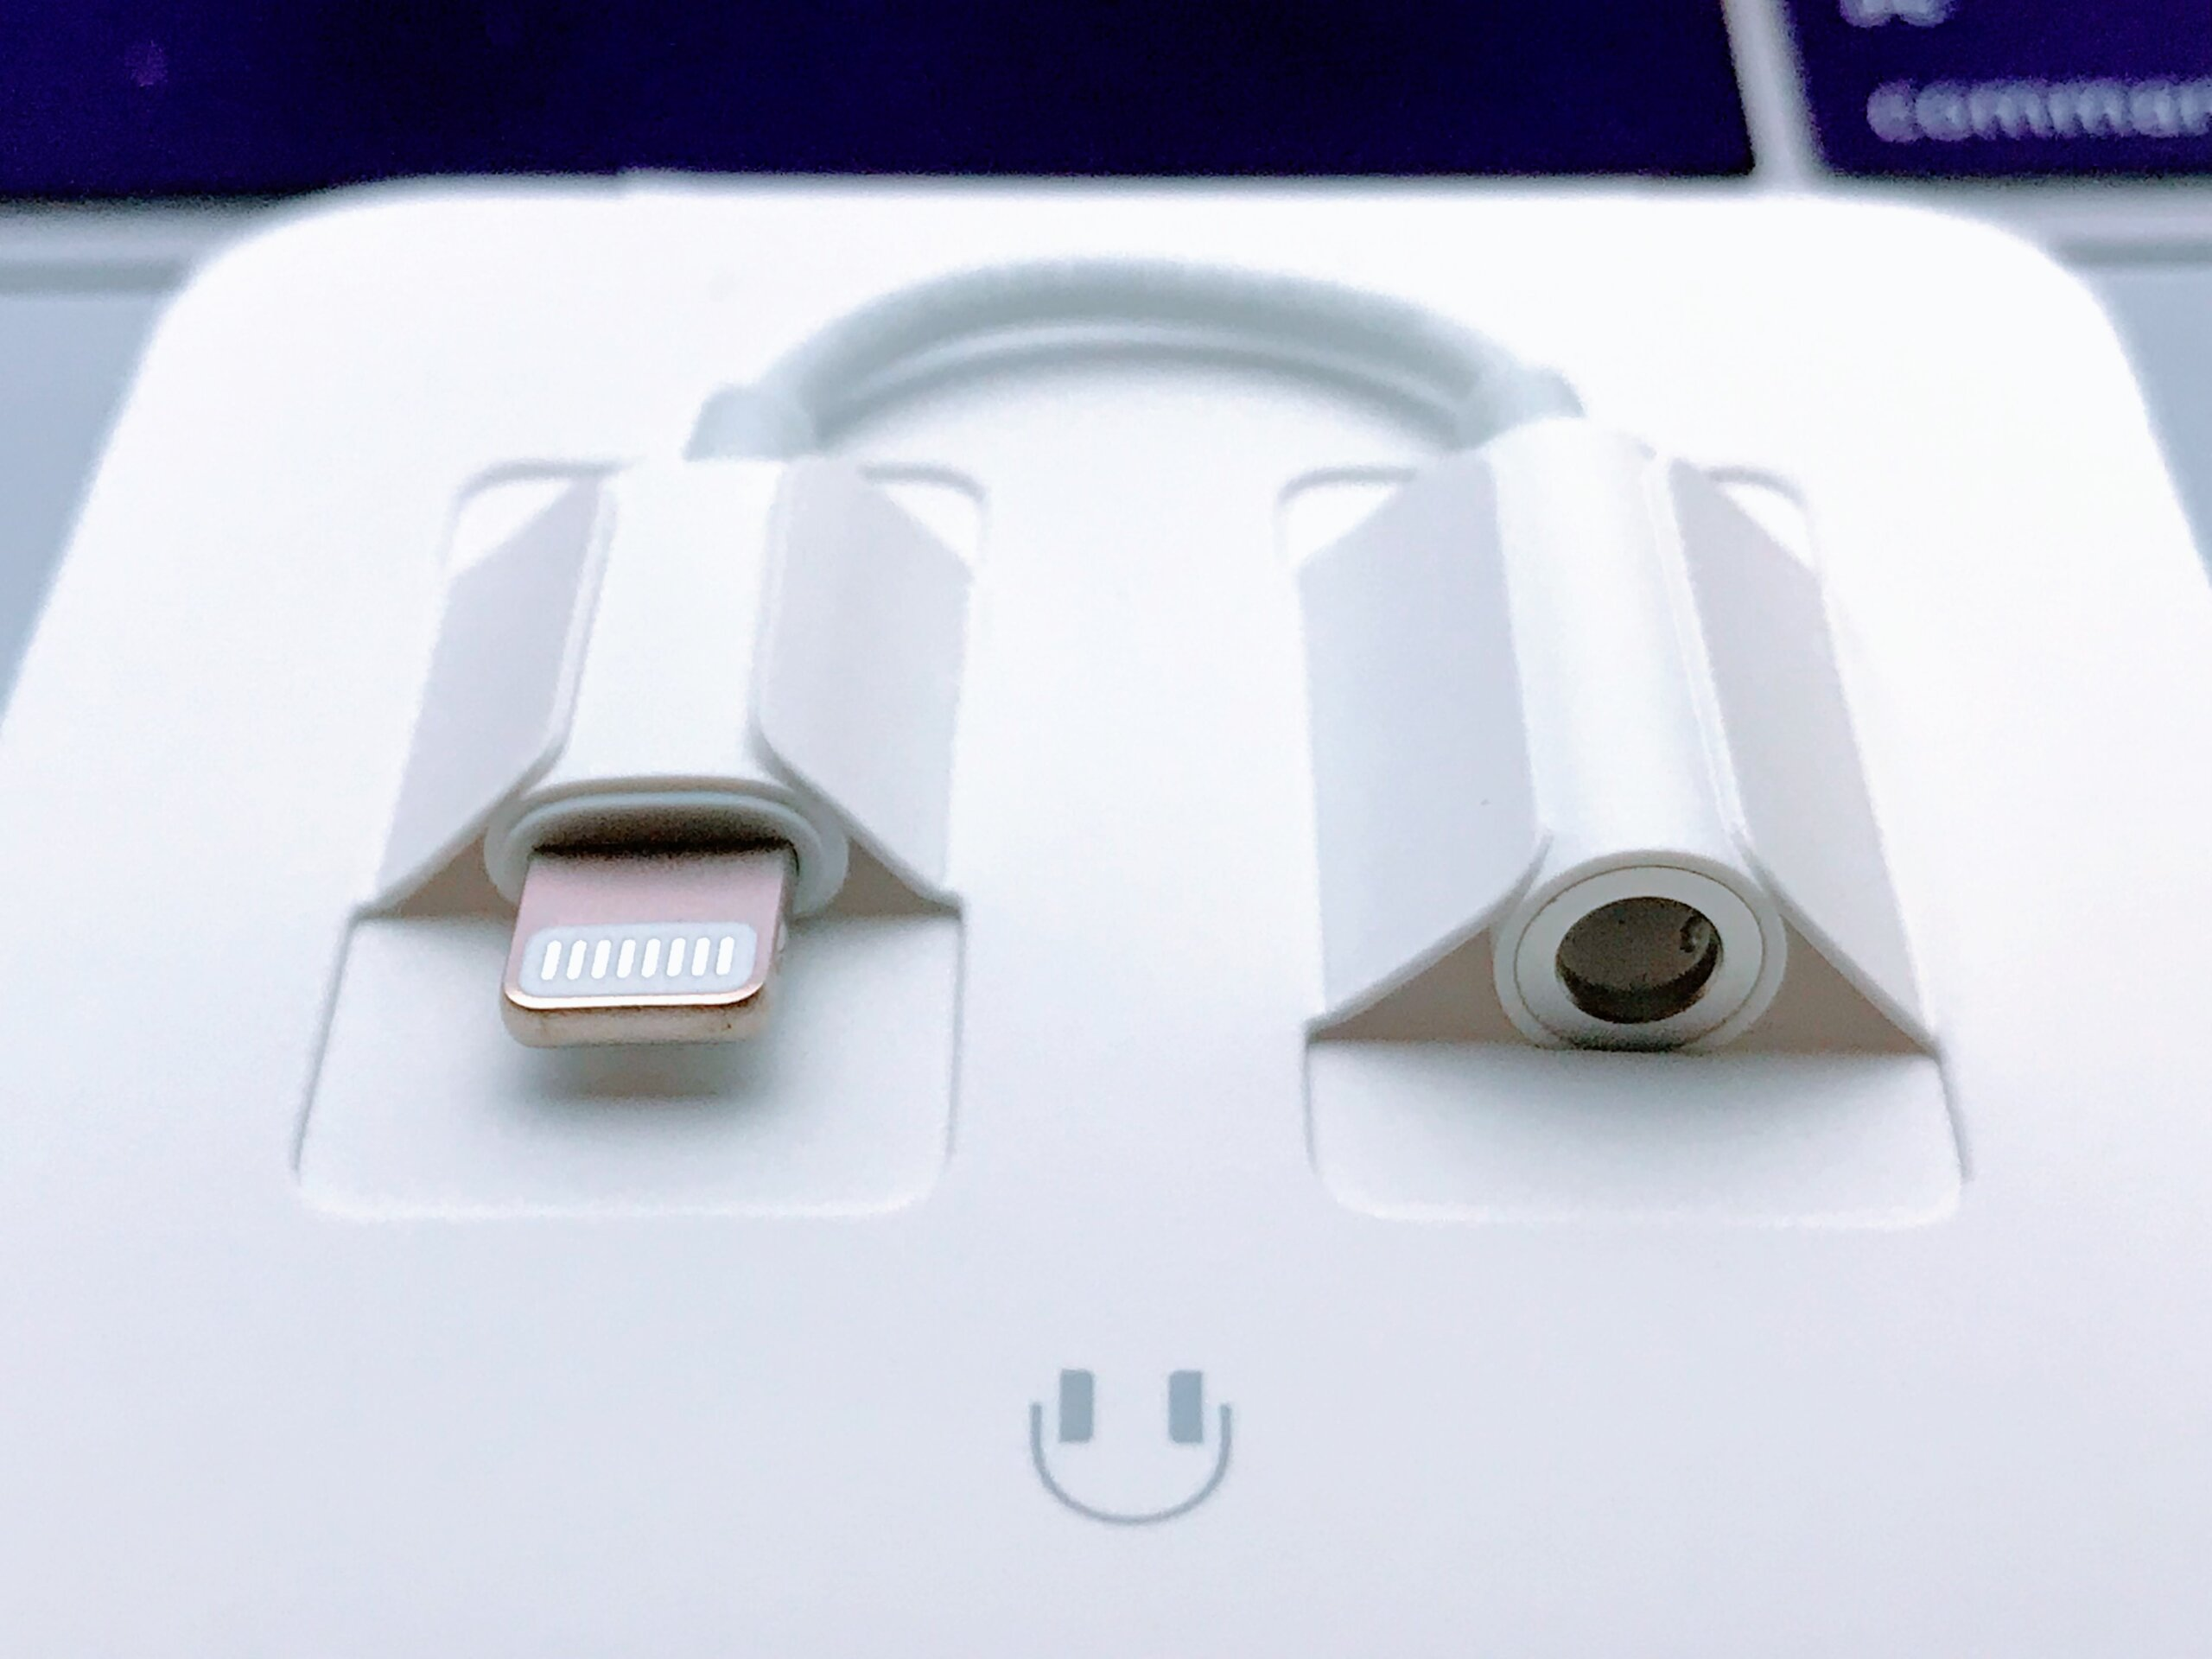 Apple iPhone Lightning to 3.5 mm Headphone Jack Adapter scaled